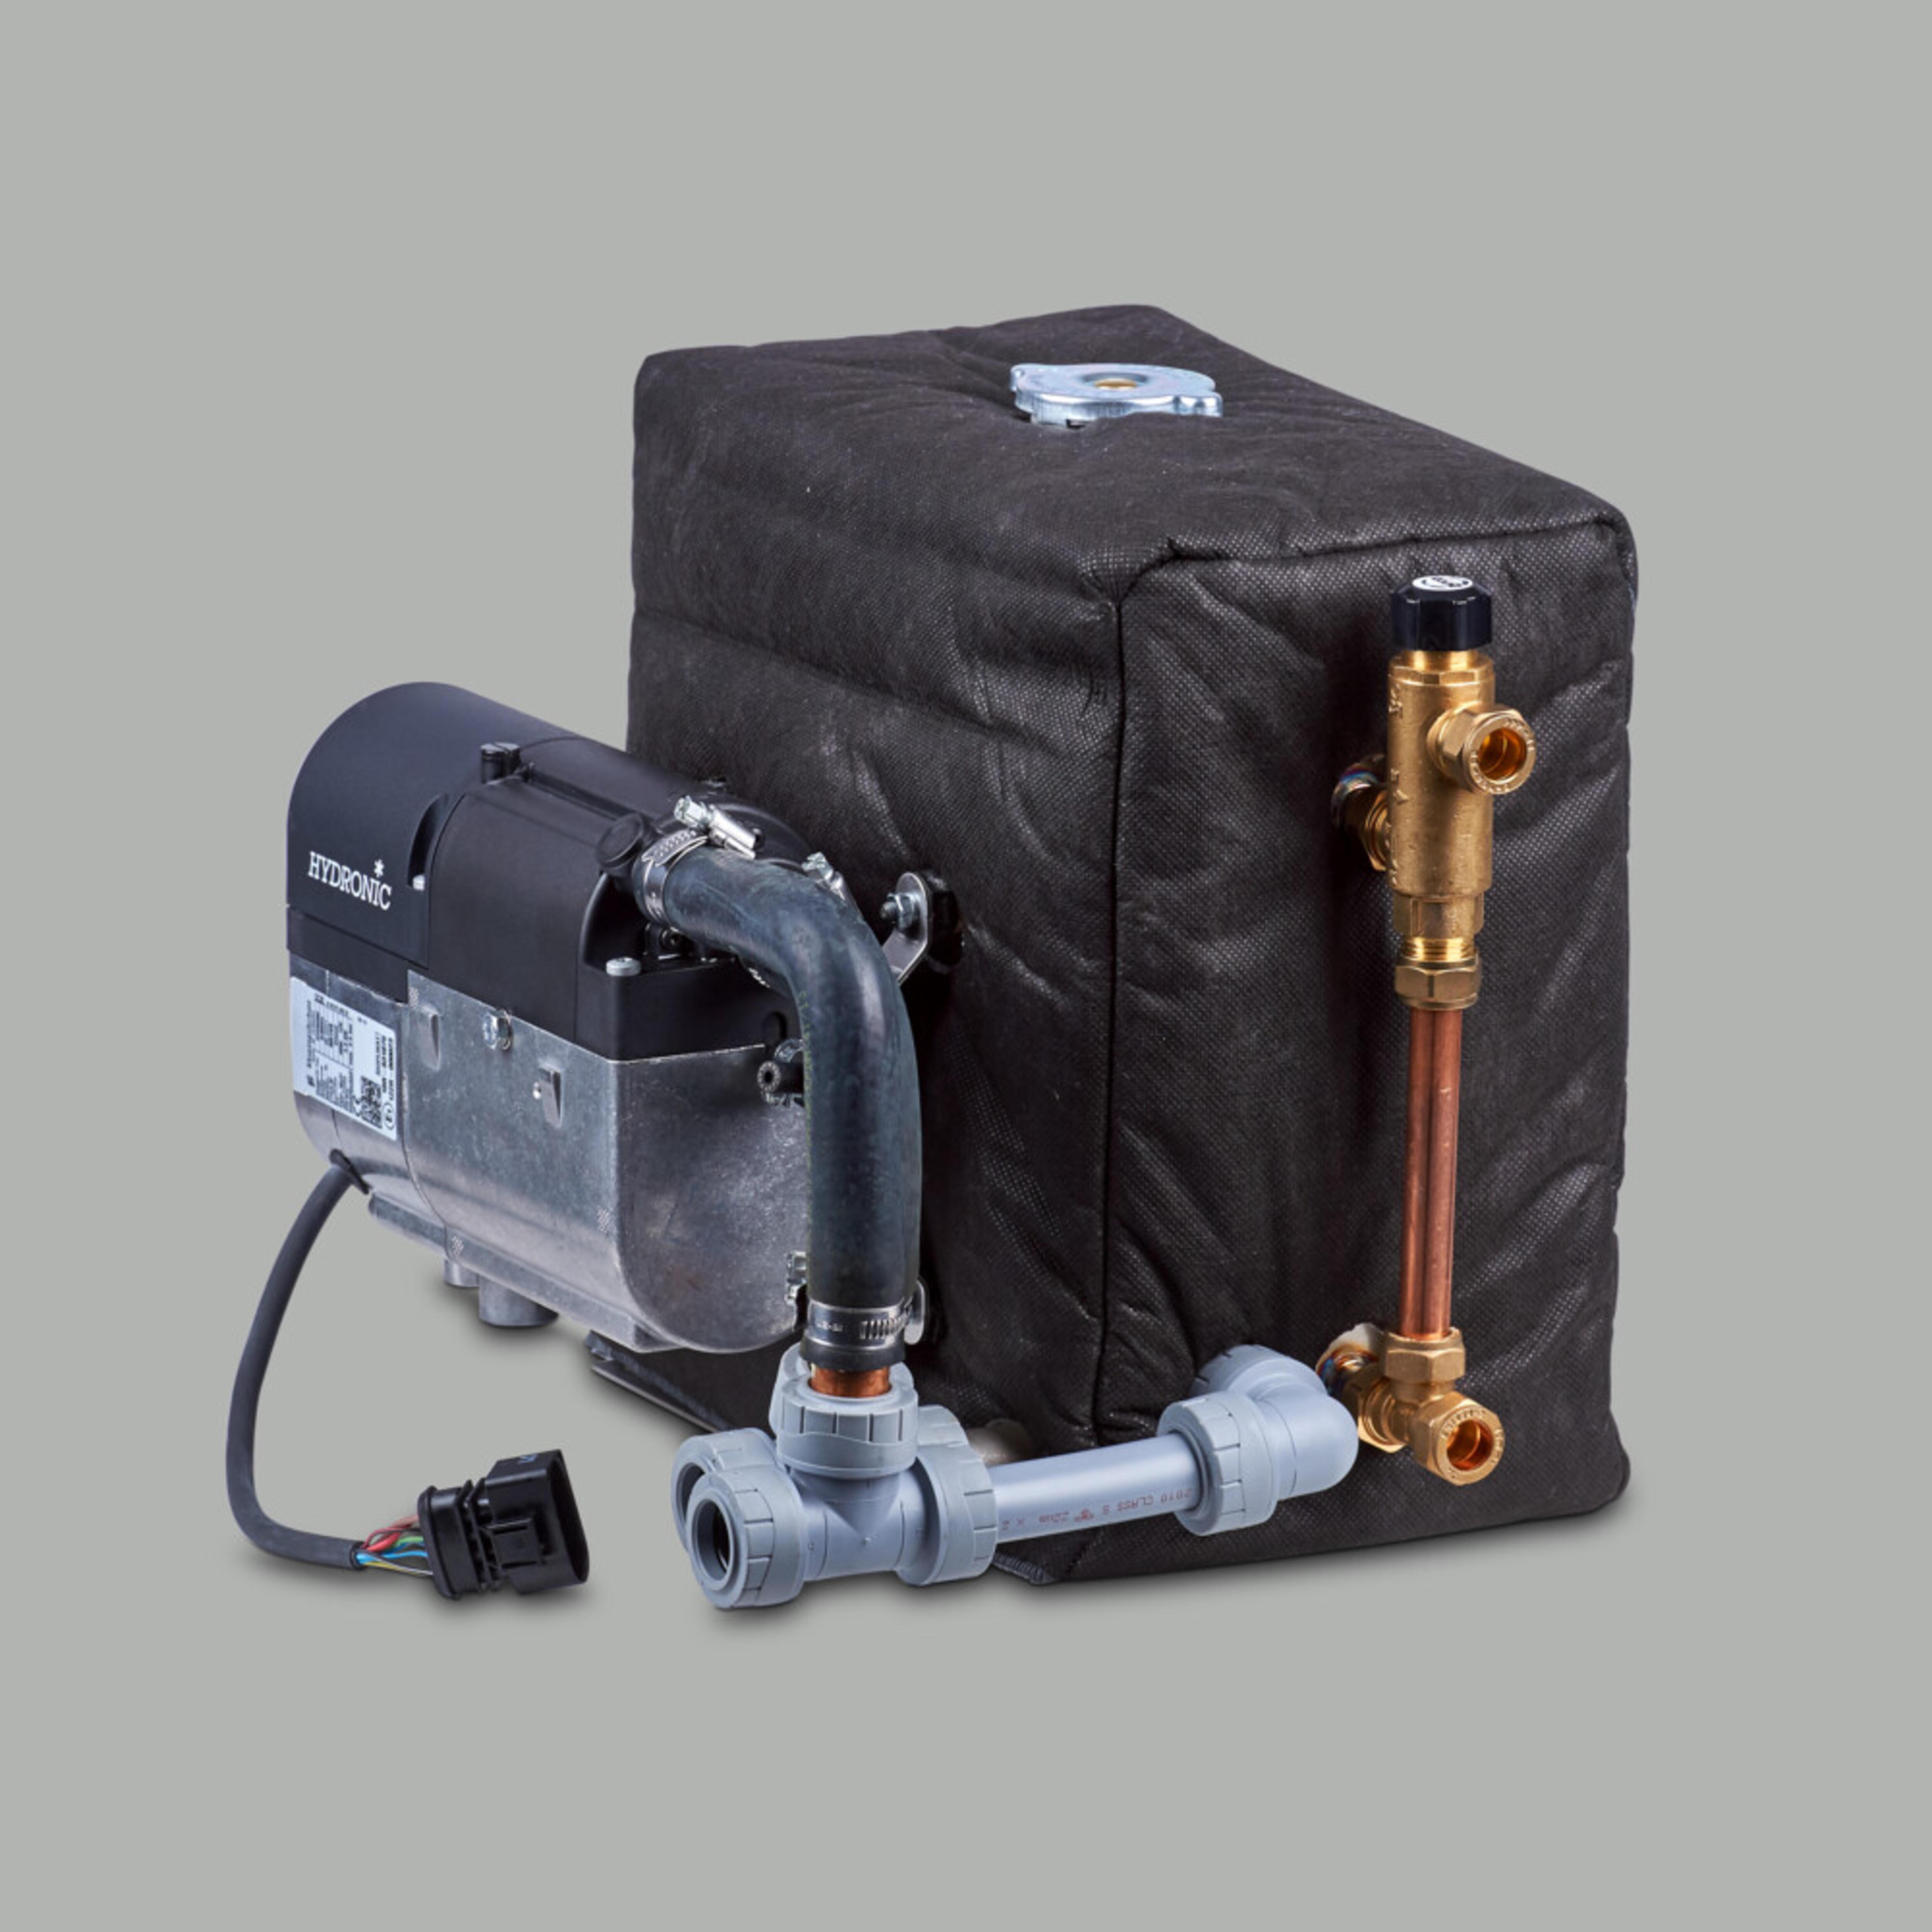 Eberspächer Hydroplate Basic kit